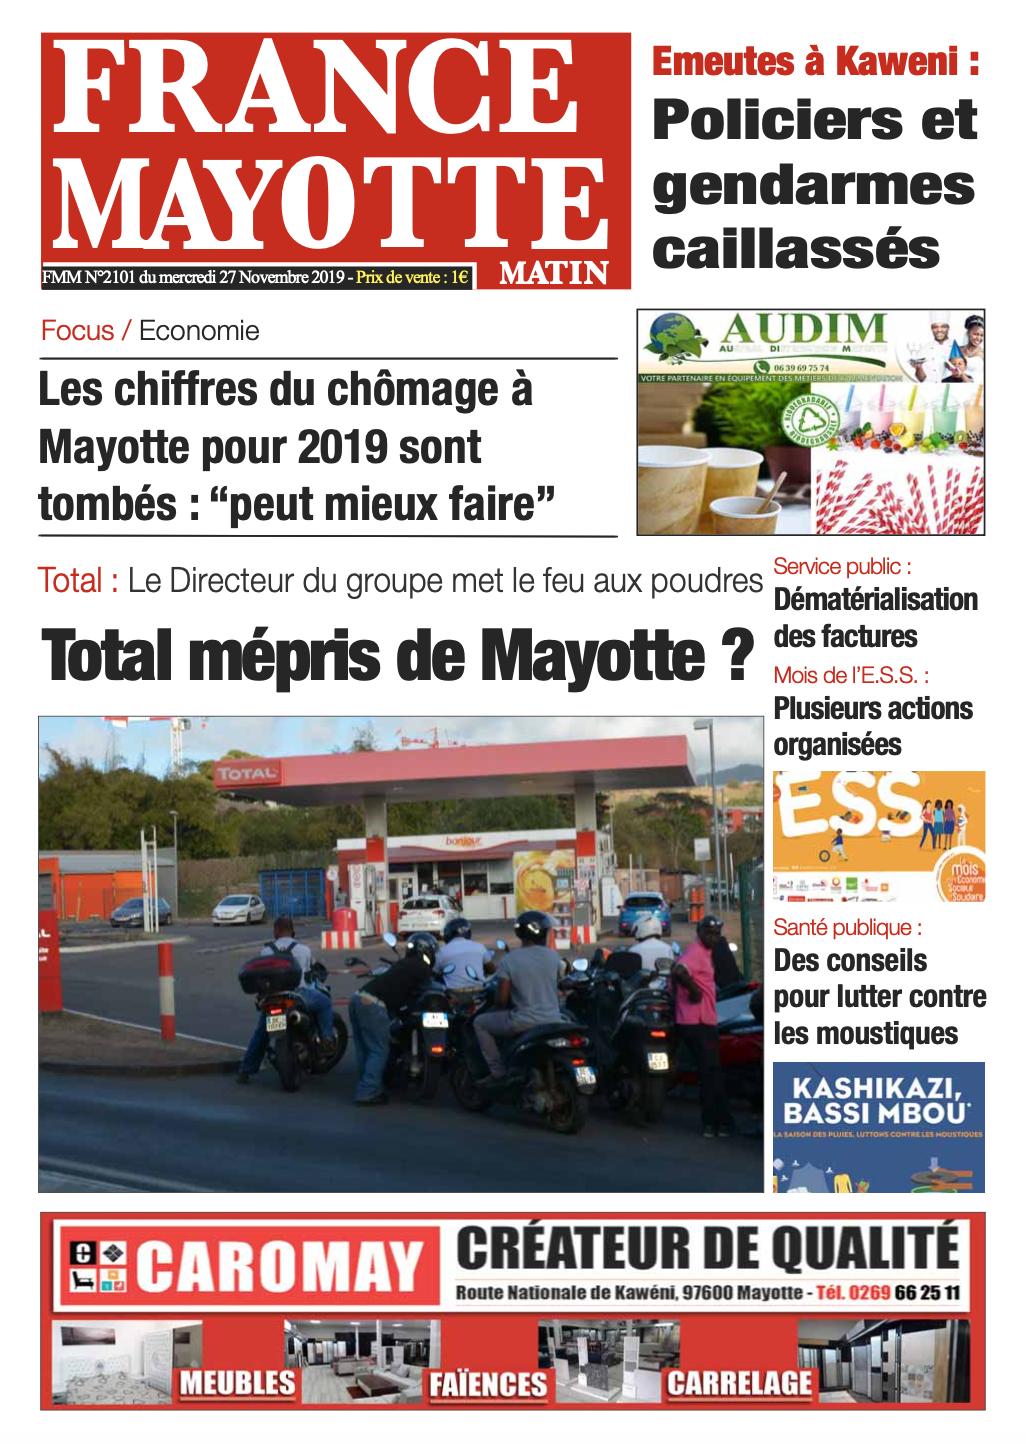 France Mayotte Mercredi 27 novembre 2019